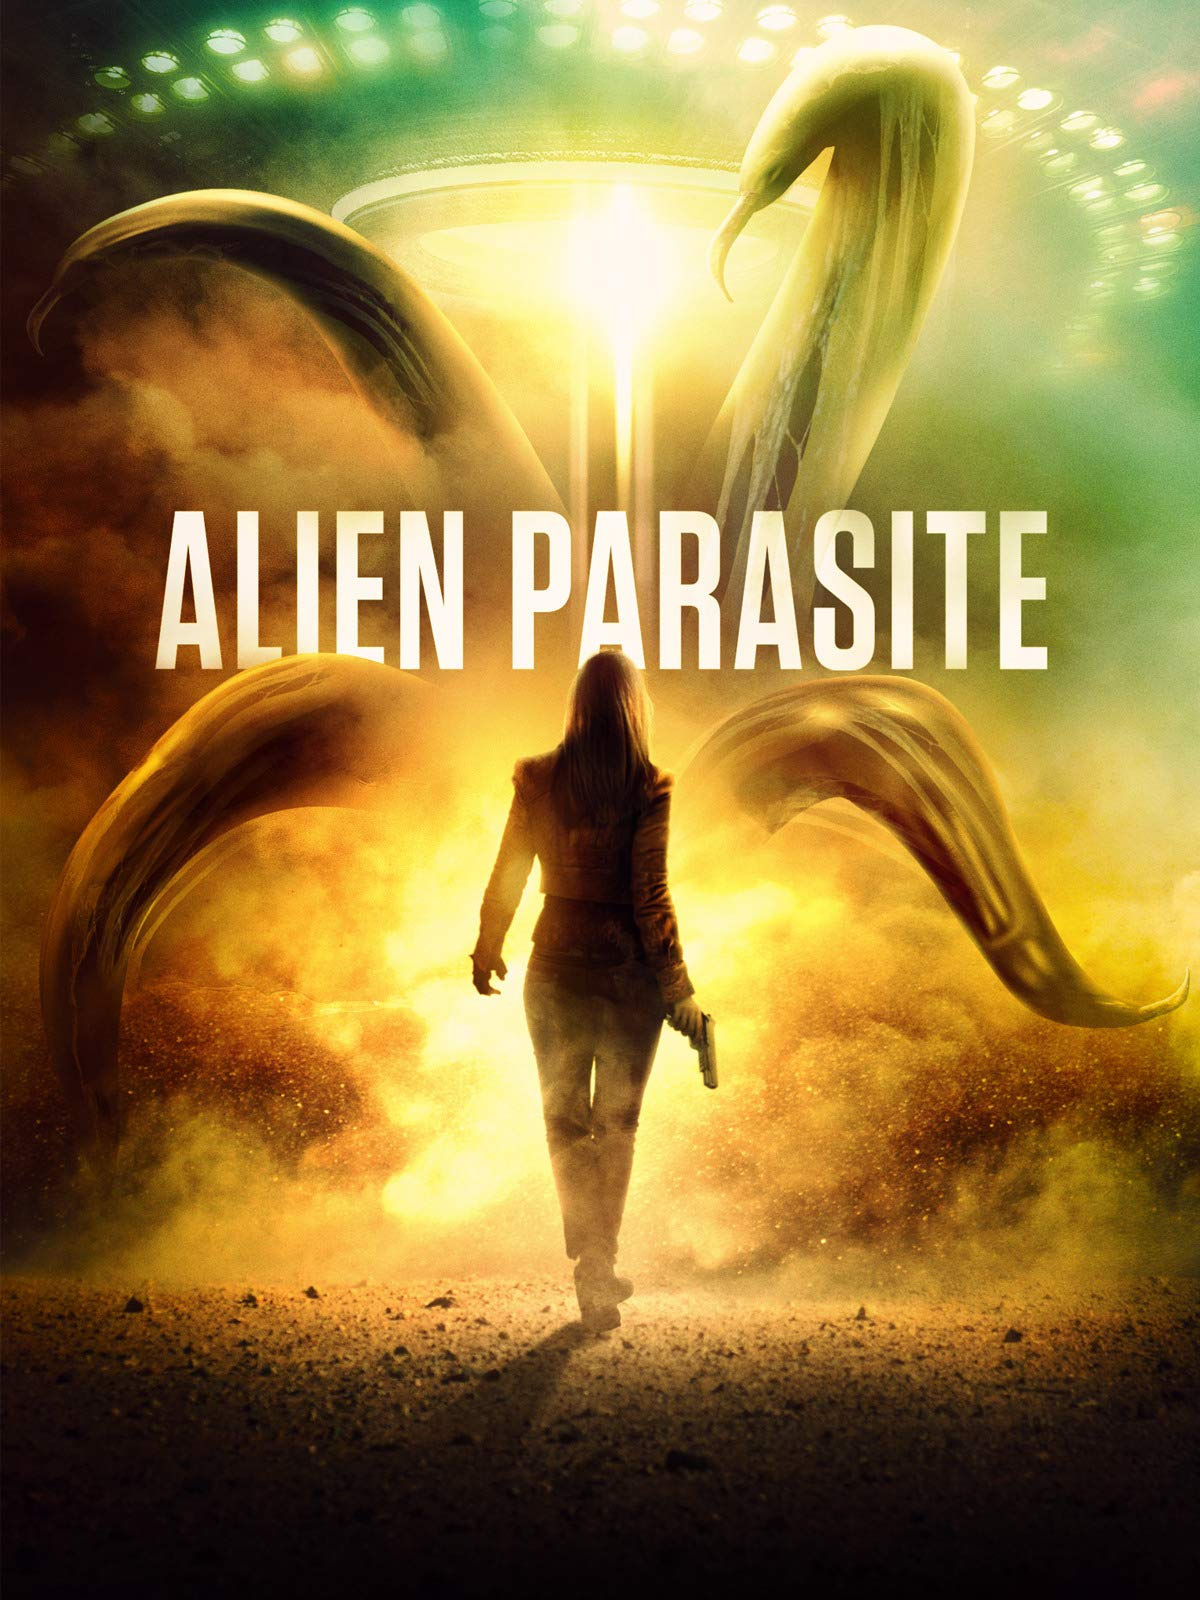 Alien Parasite [AKA The Dustwalker] (2020, dir. SandraSciberras)